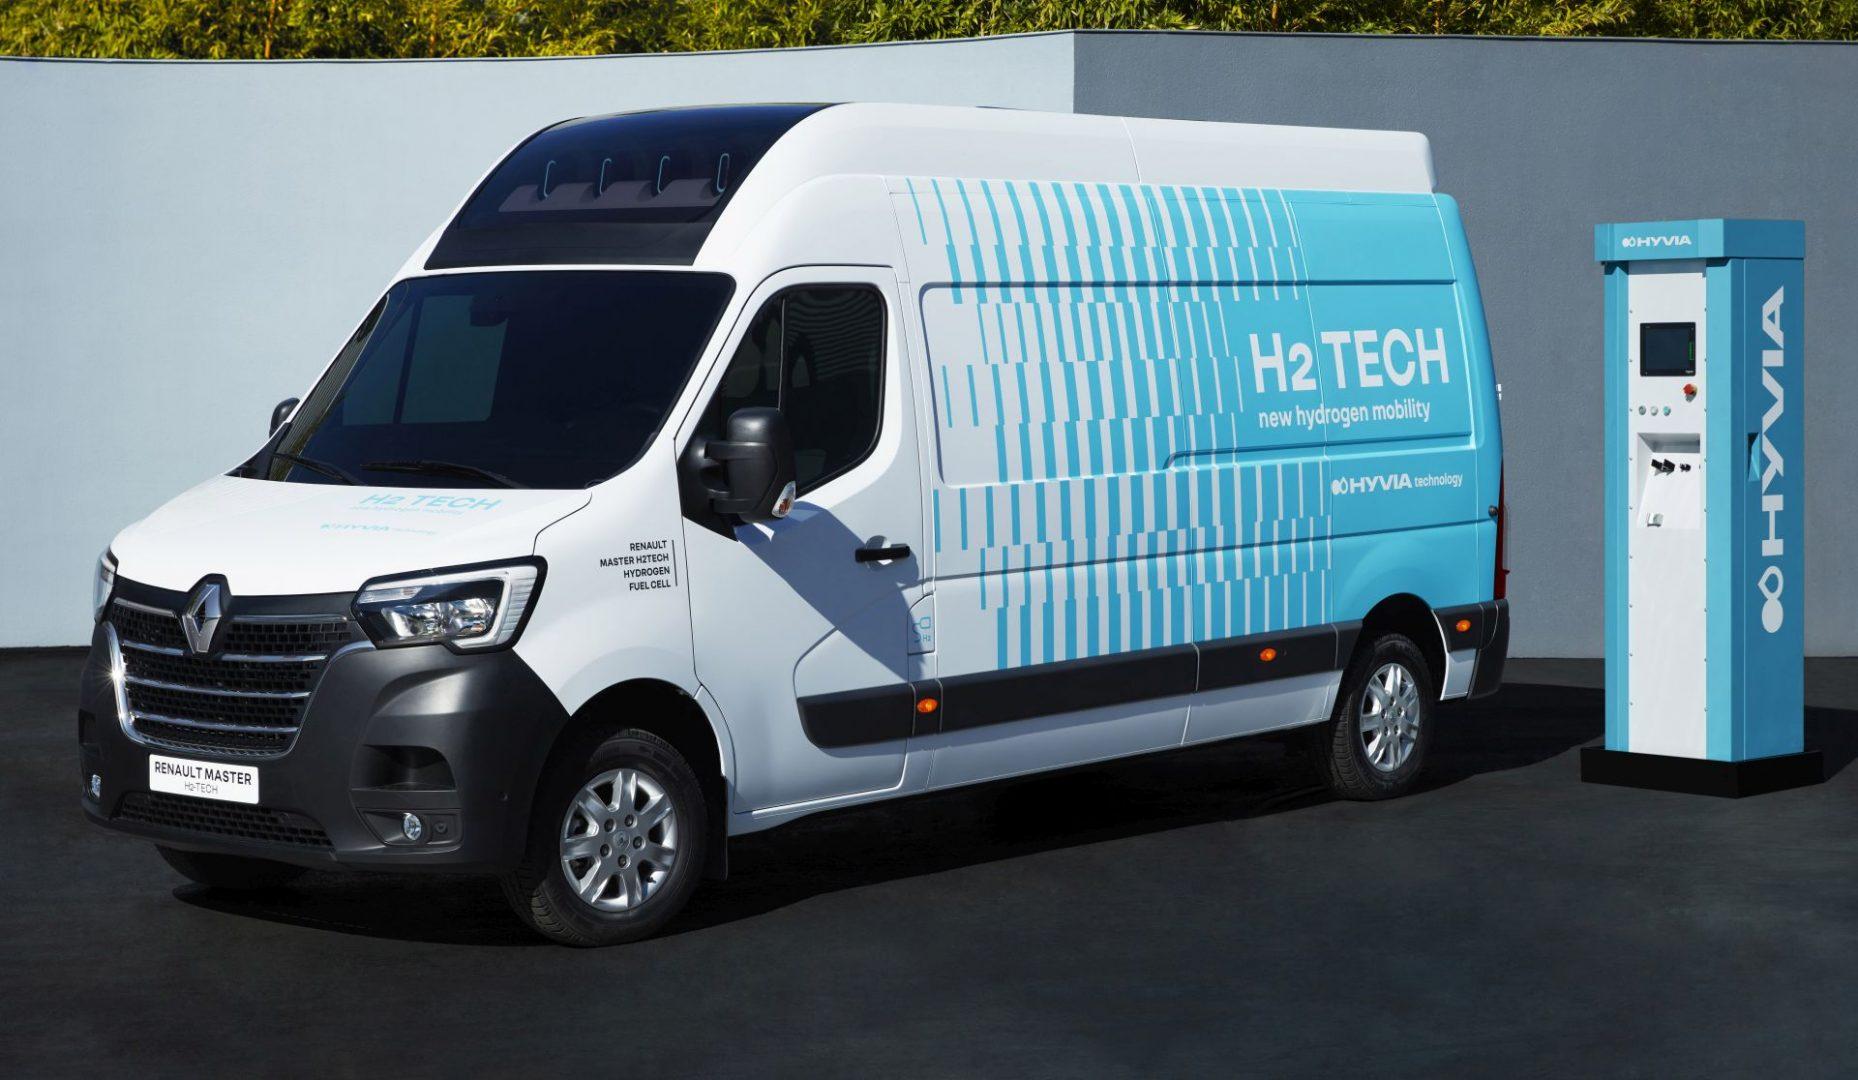 HYVIA predstavlja prototip Renault Mastera Van H2-TECH i stanicu za opskrbu vodikom